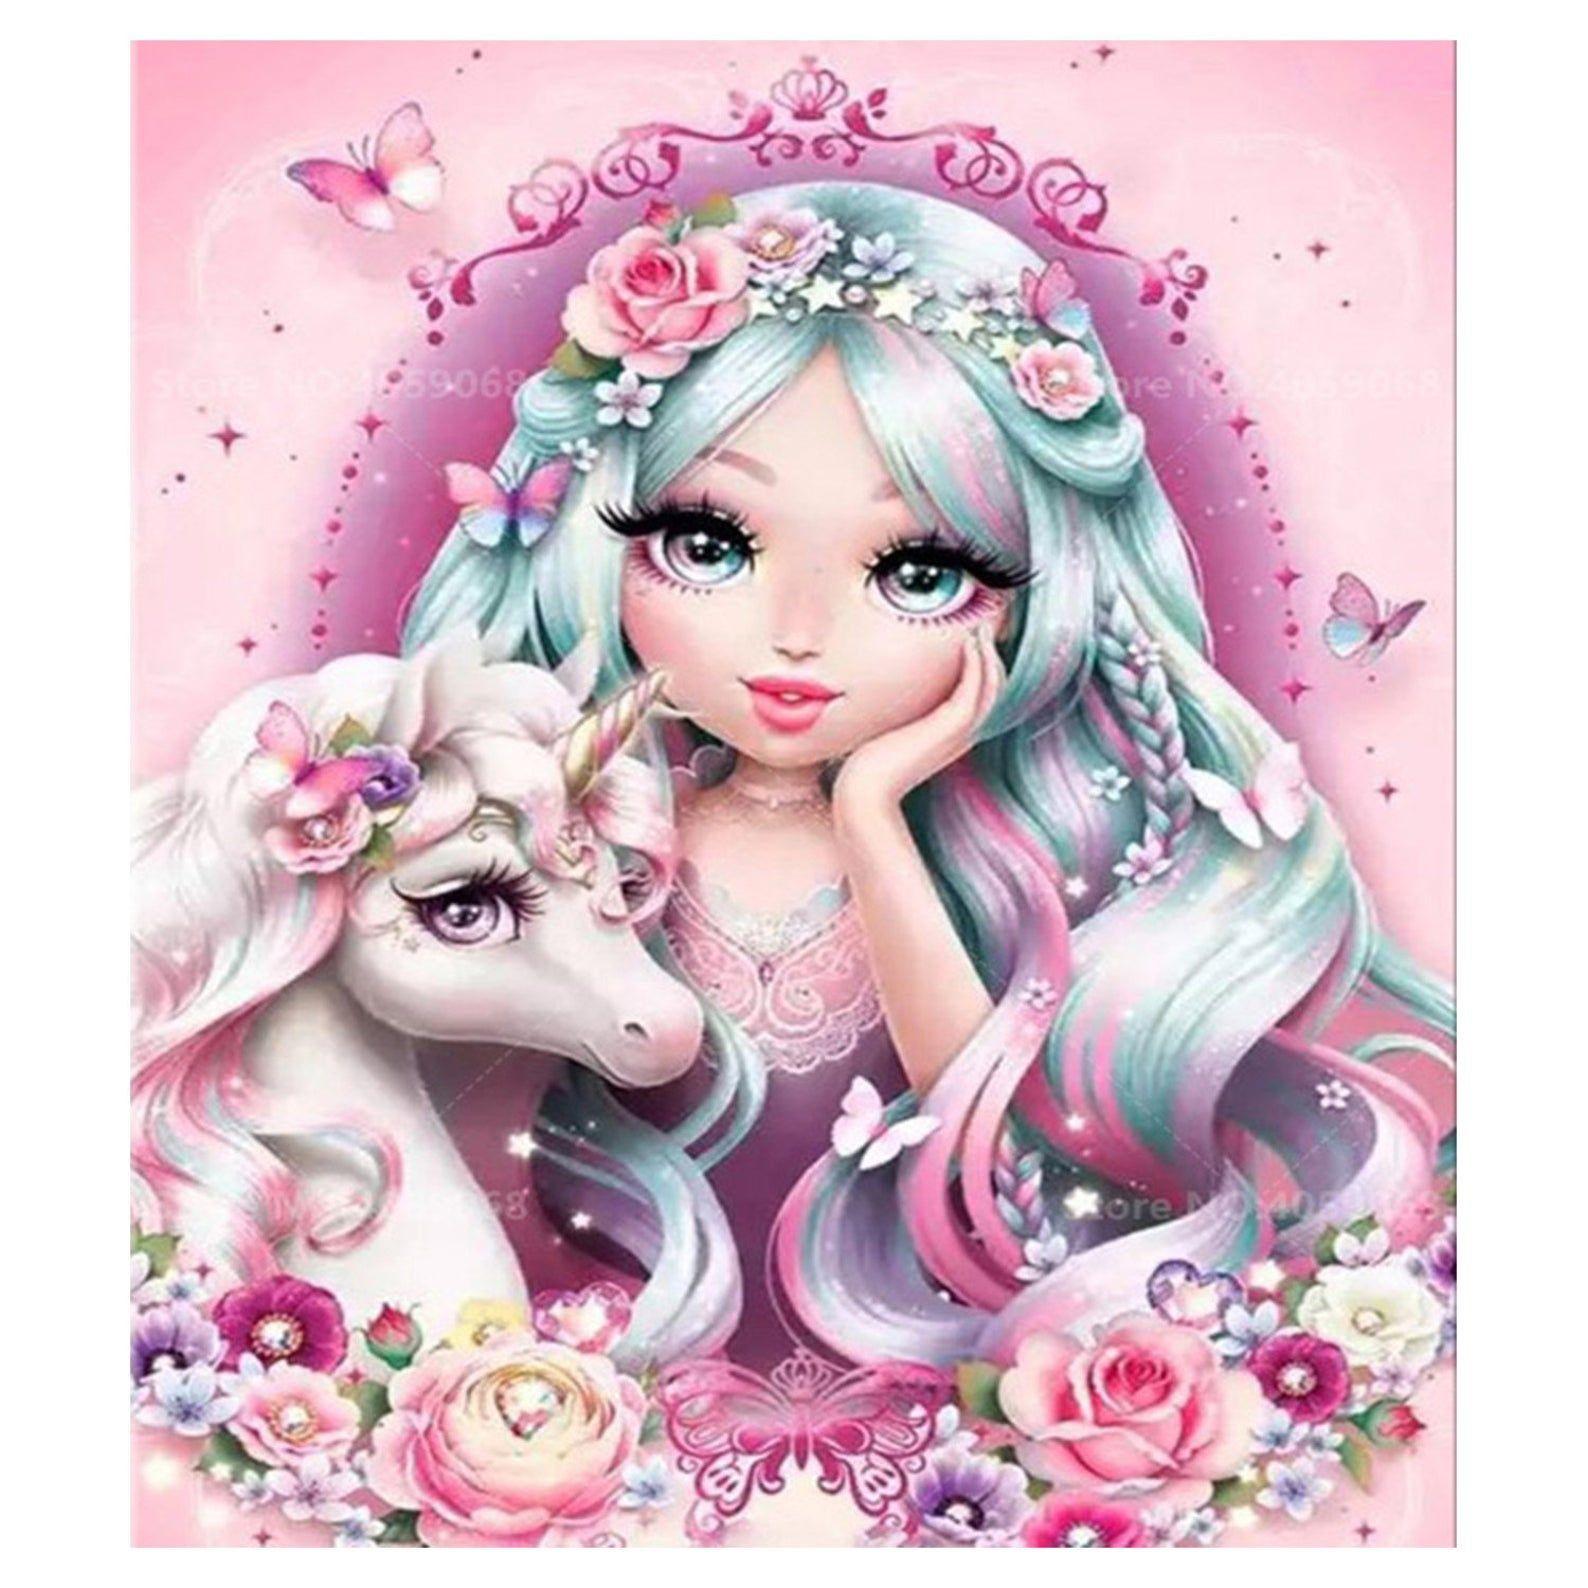 Full Drill Unicorn DIY 5D Diamond Painting Kits Art Embroidery Home Decor Gifts